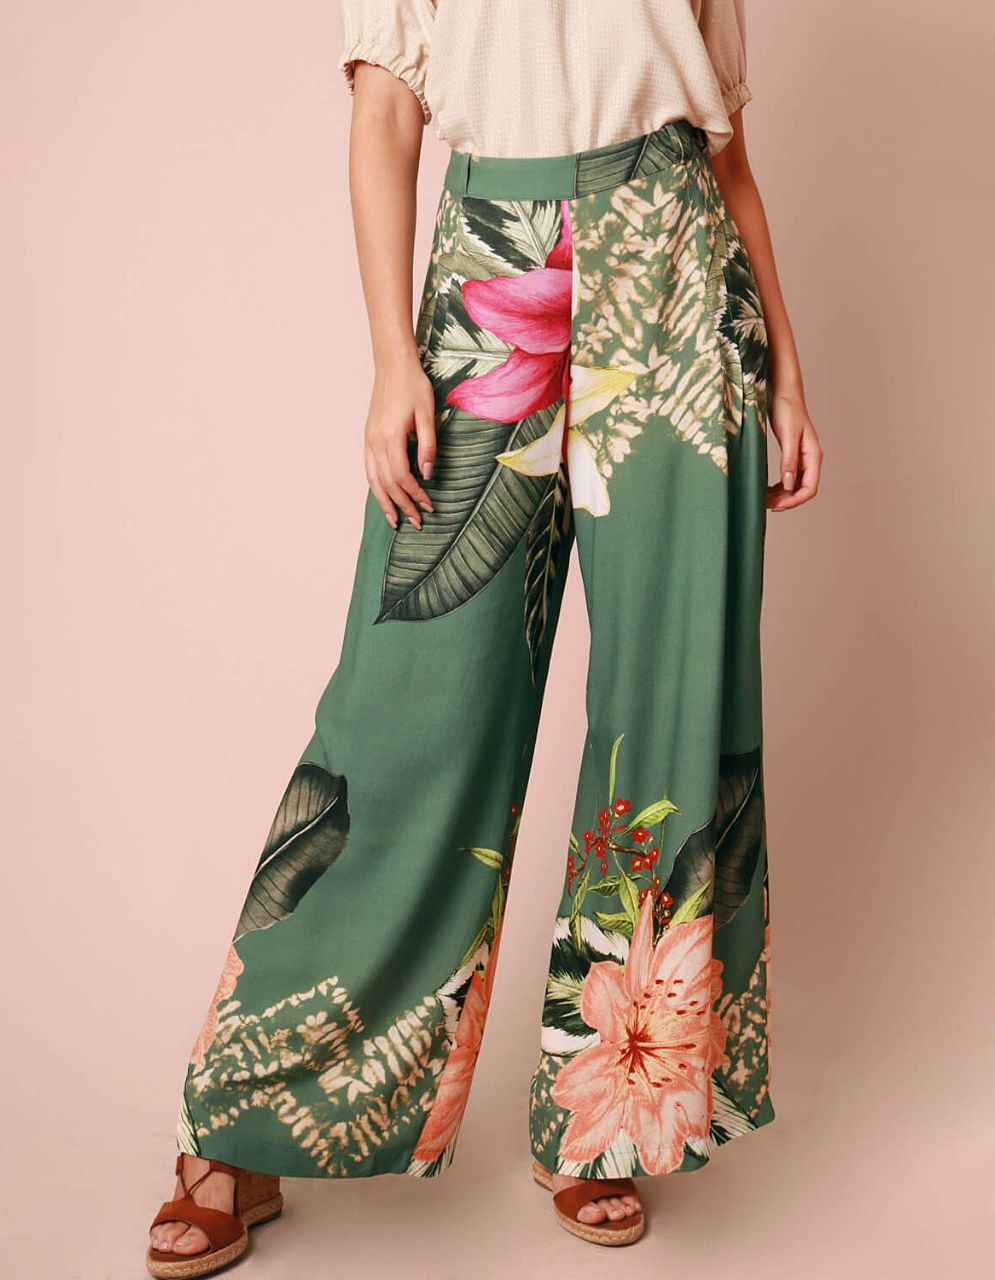 Pantalón largo verano verde o marrón estampa floral y cremallera lateral ajustable | Malagueta